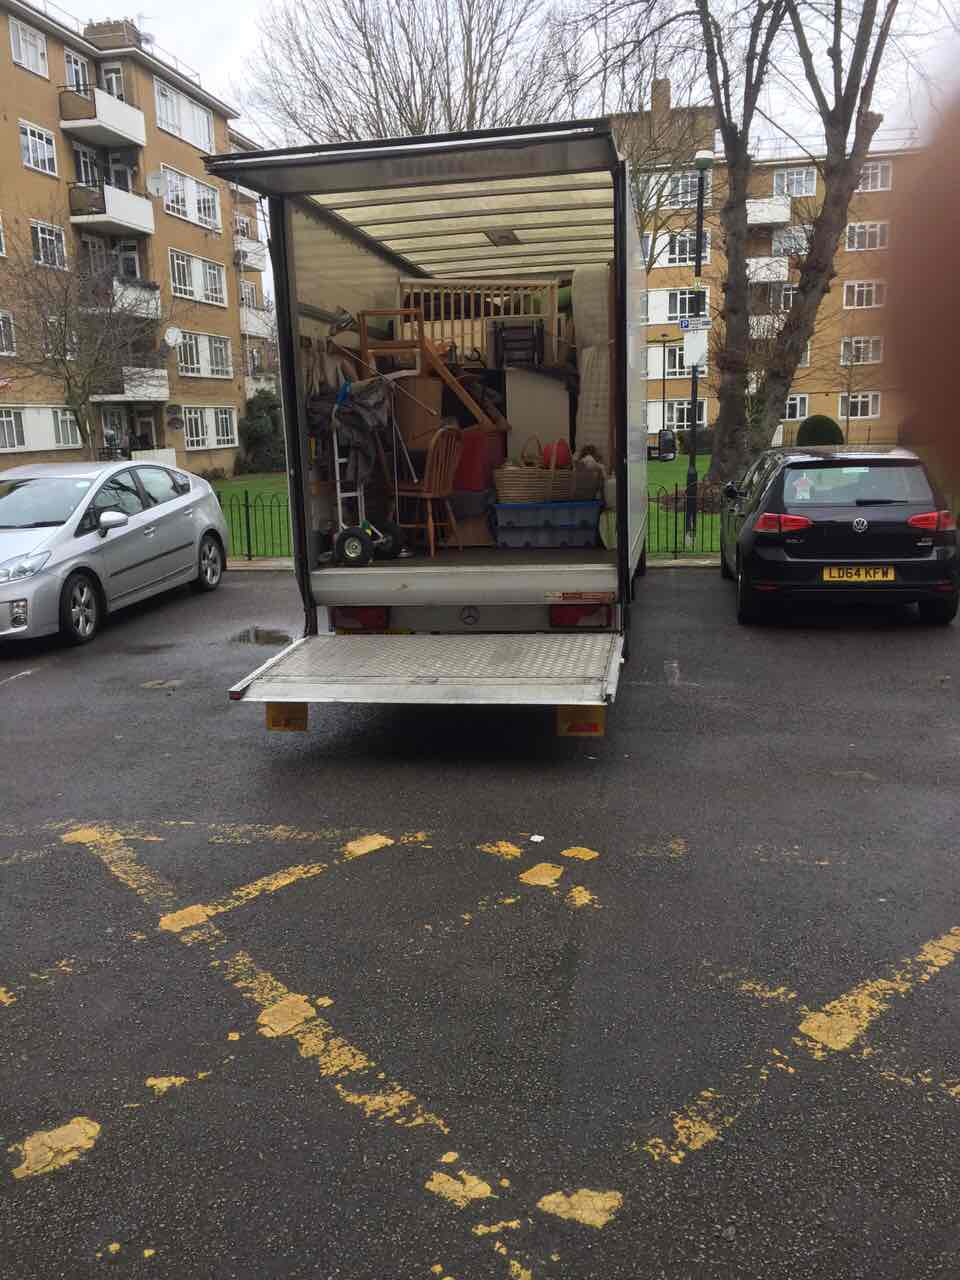 UB8 van for hire in Cowley